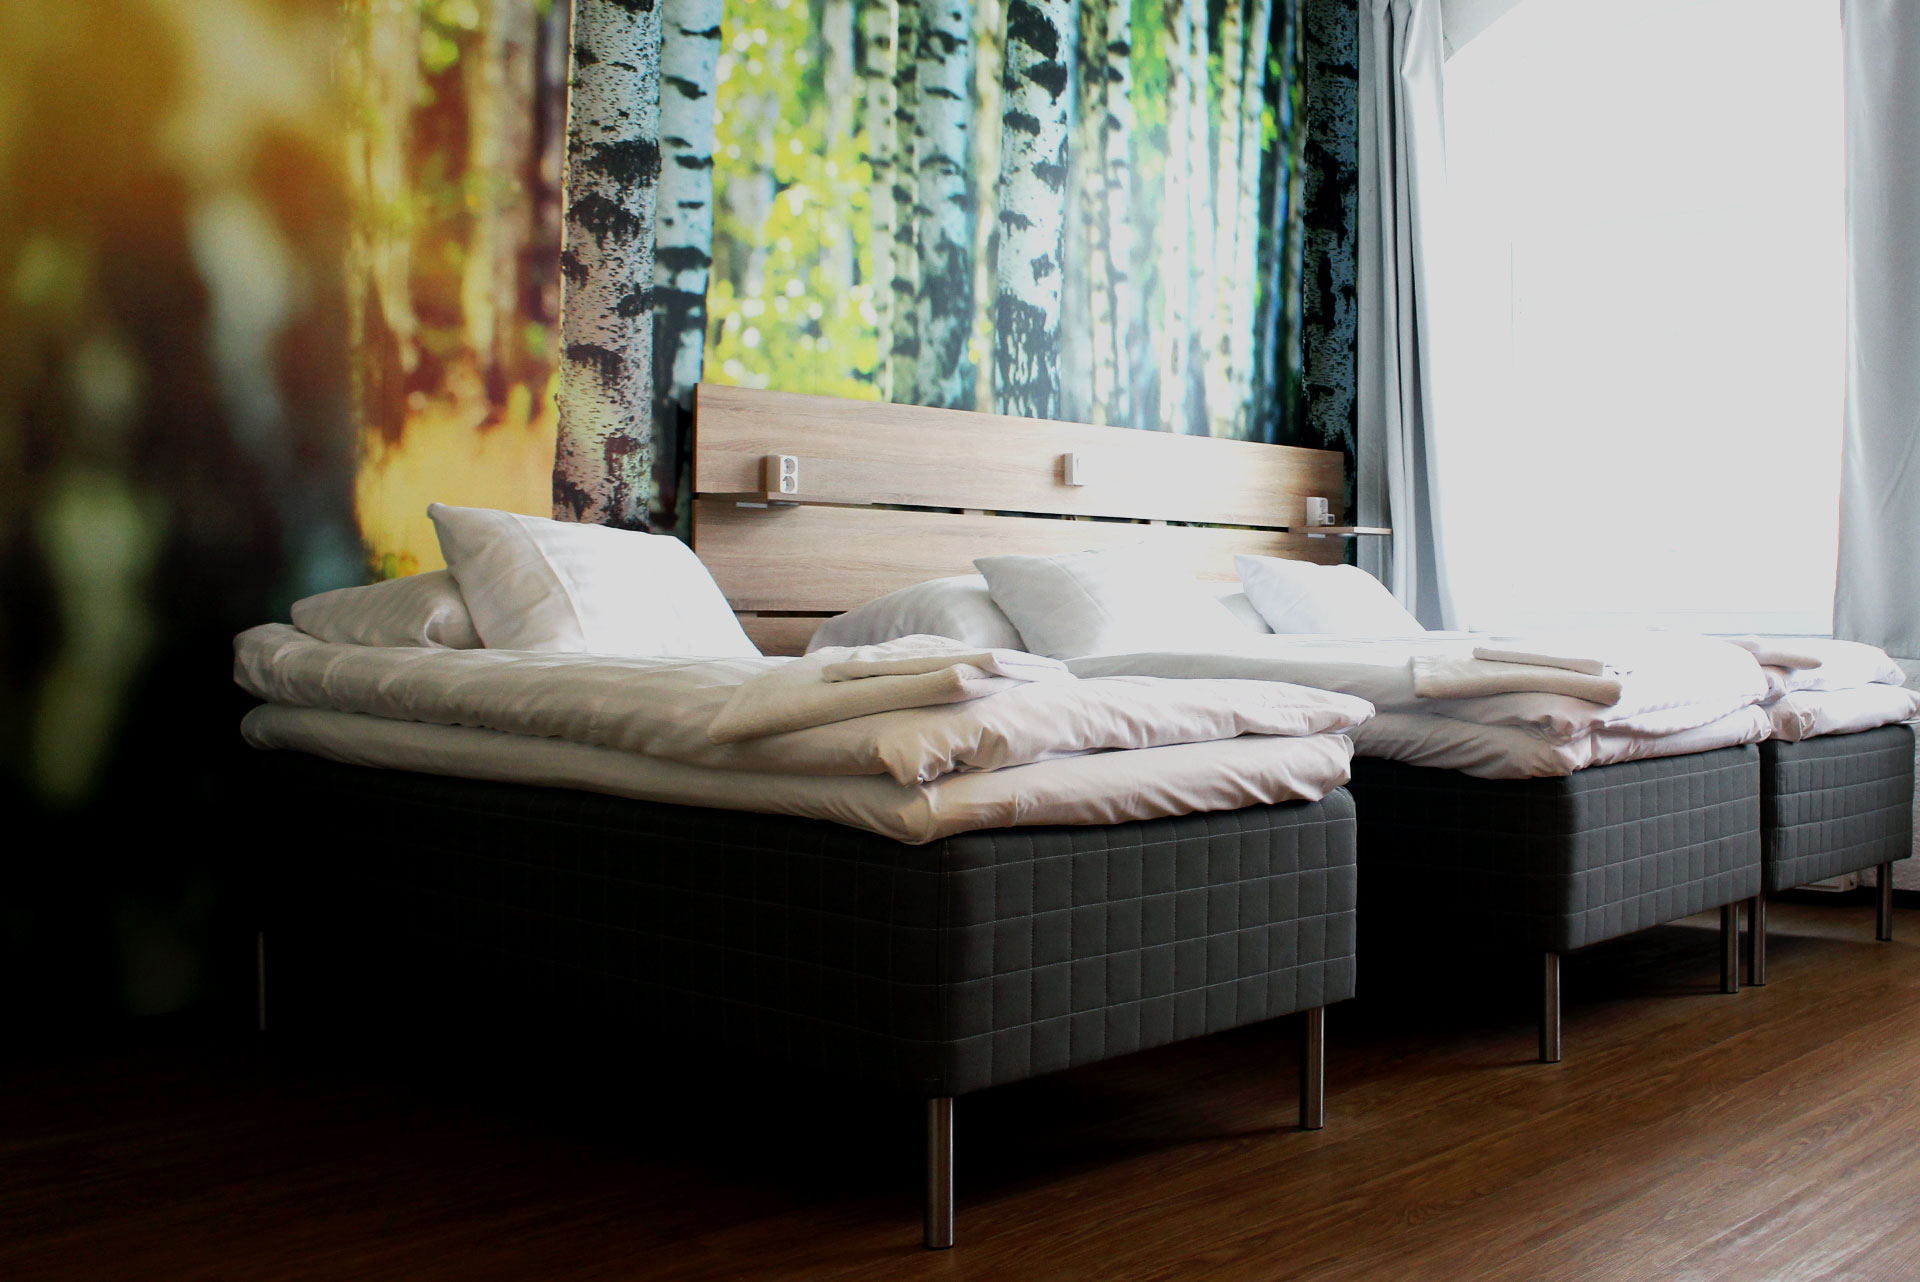 Laadukas hotelli: Place to Sleep Hotel